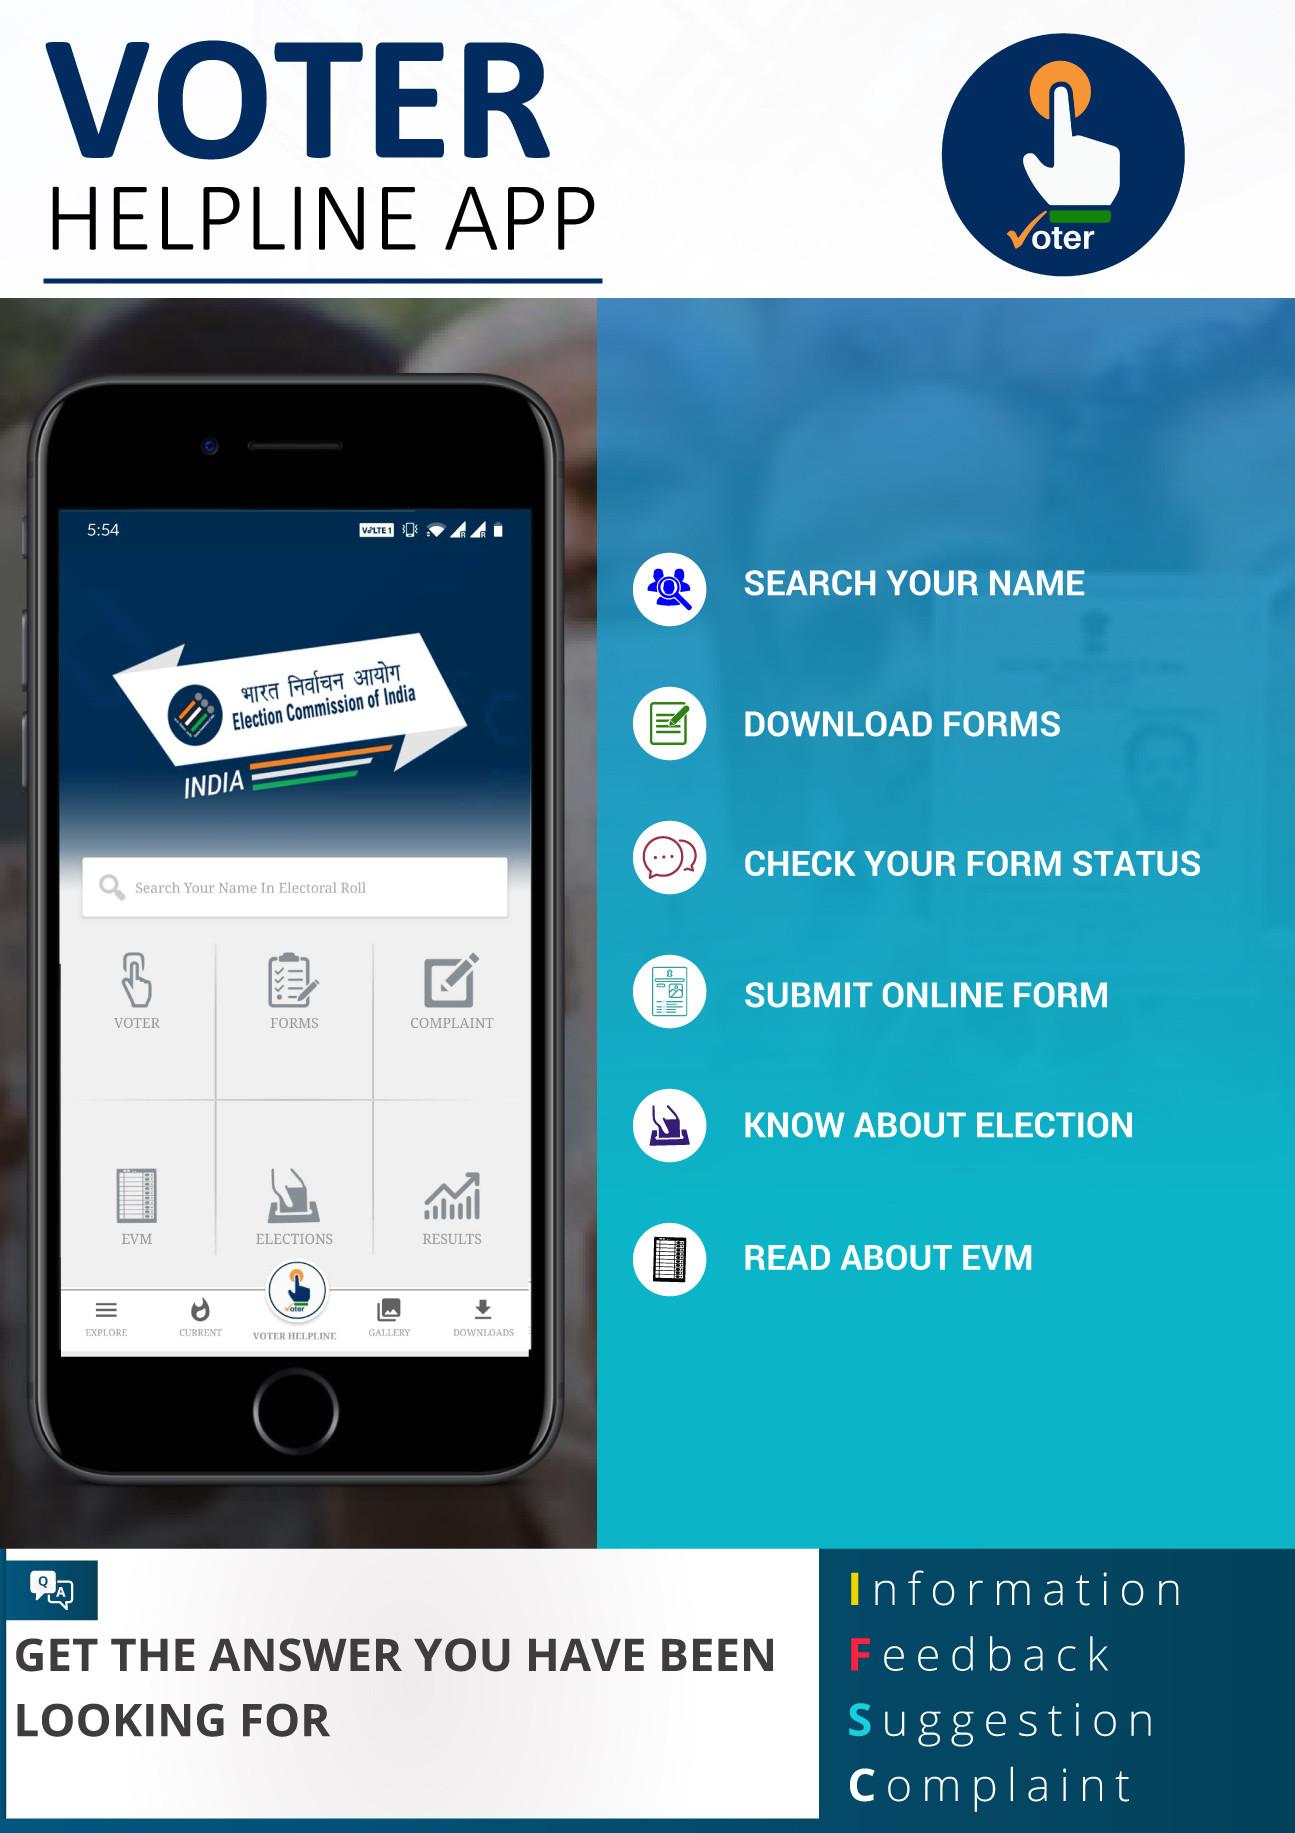 Voter Helpline App from Google Play store